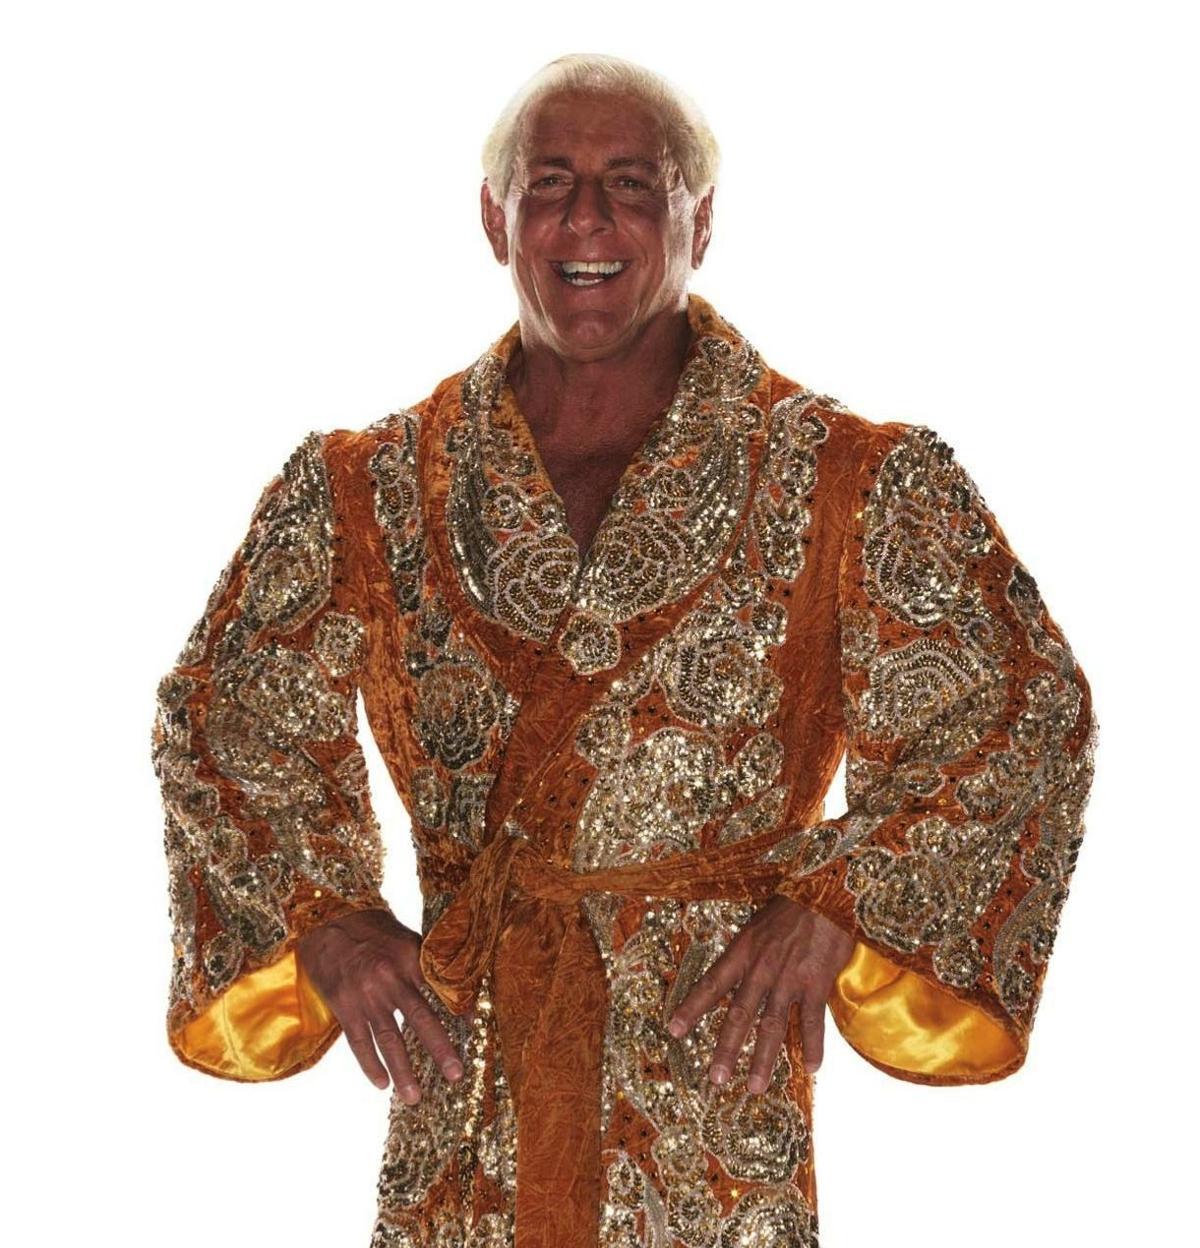 Flair, Hardys to headline Big Time Wrestling event